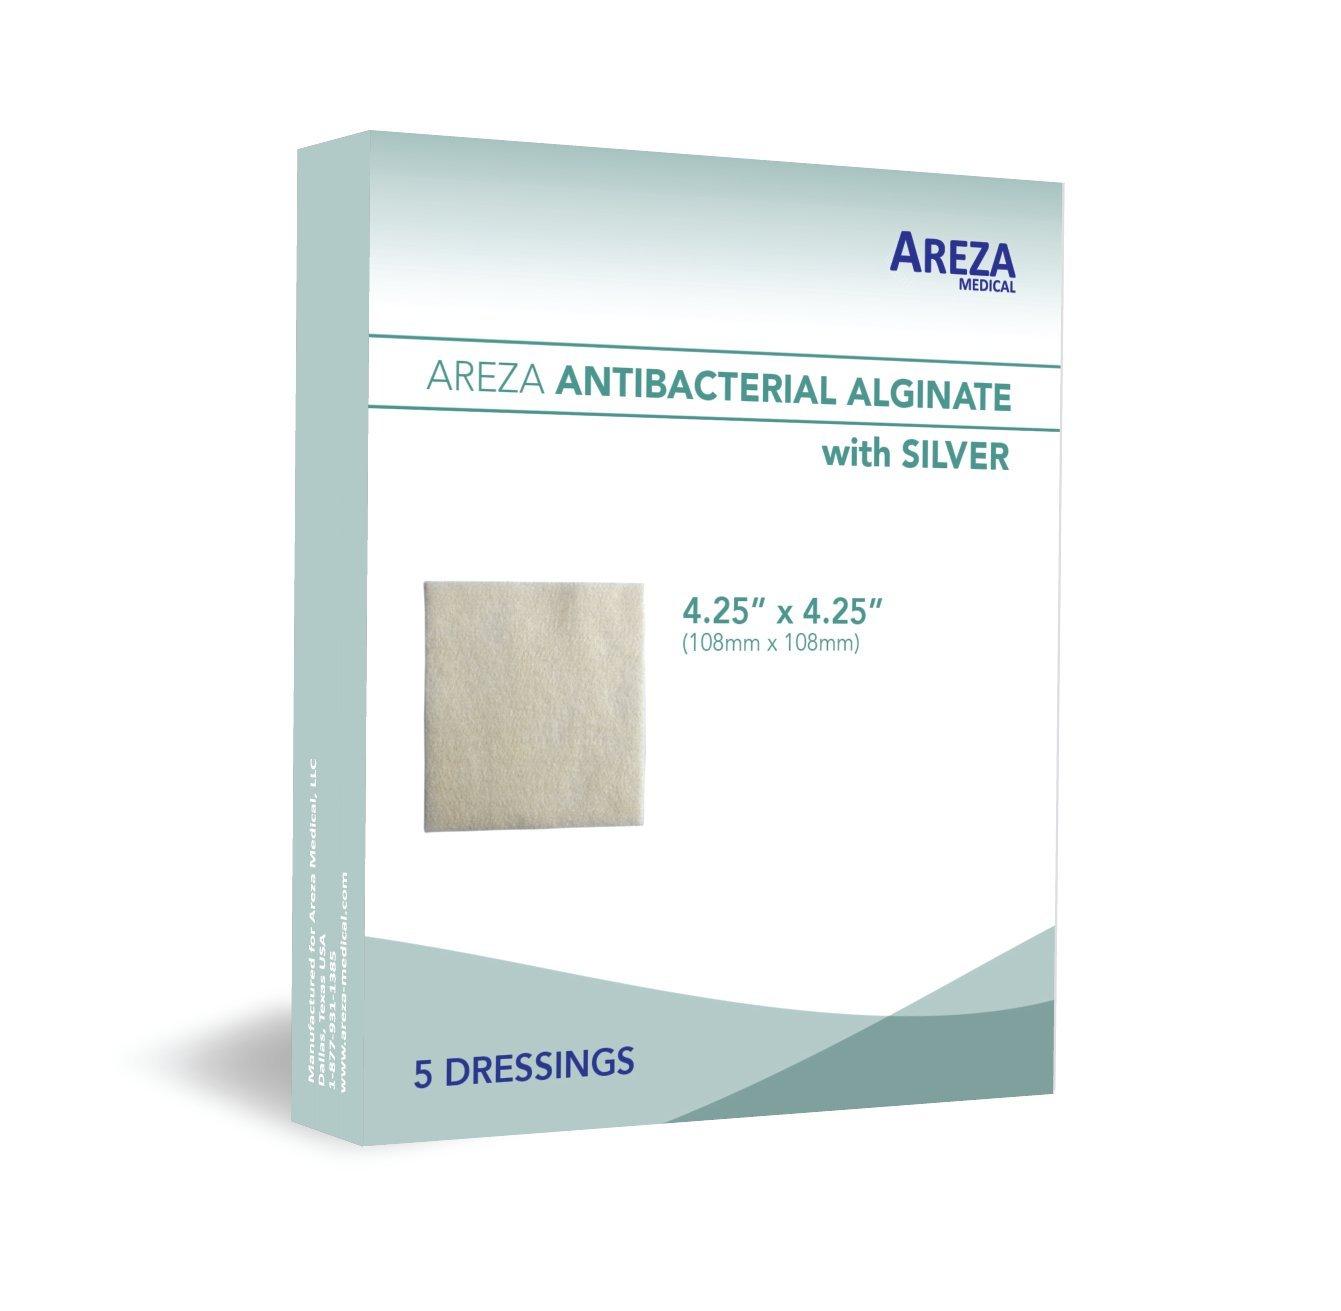 Amazon New And Improved Aquacel Ag Extra 4 X 5 Box Of 10